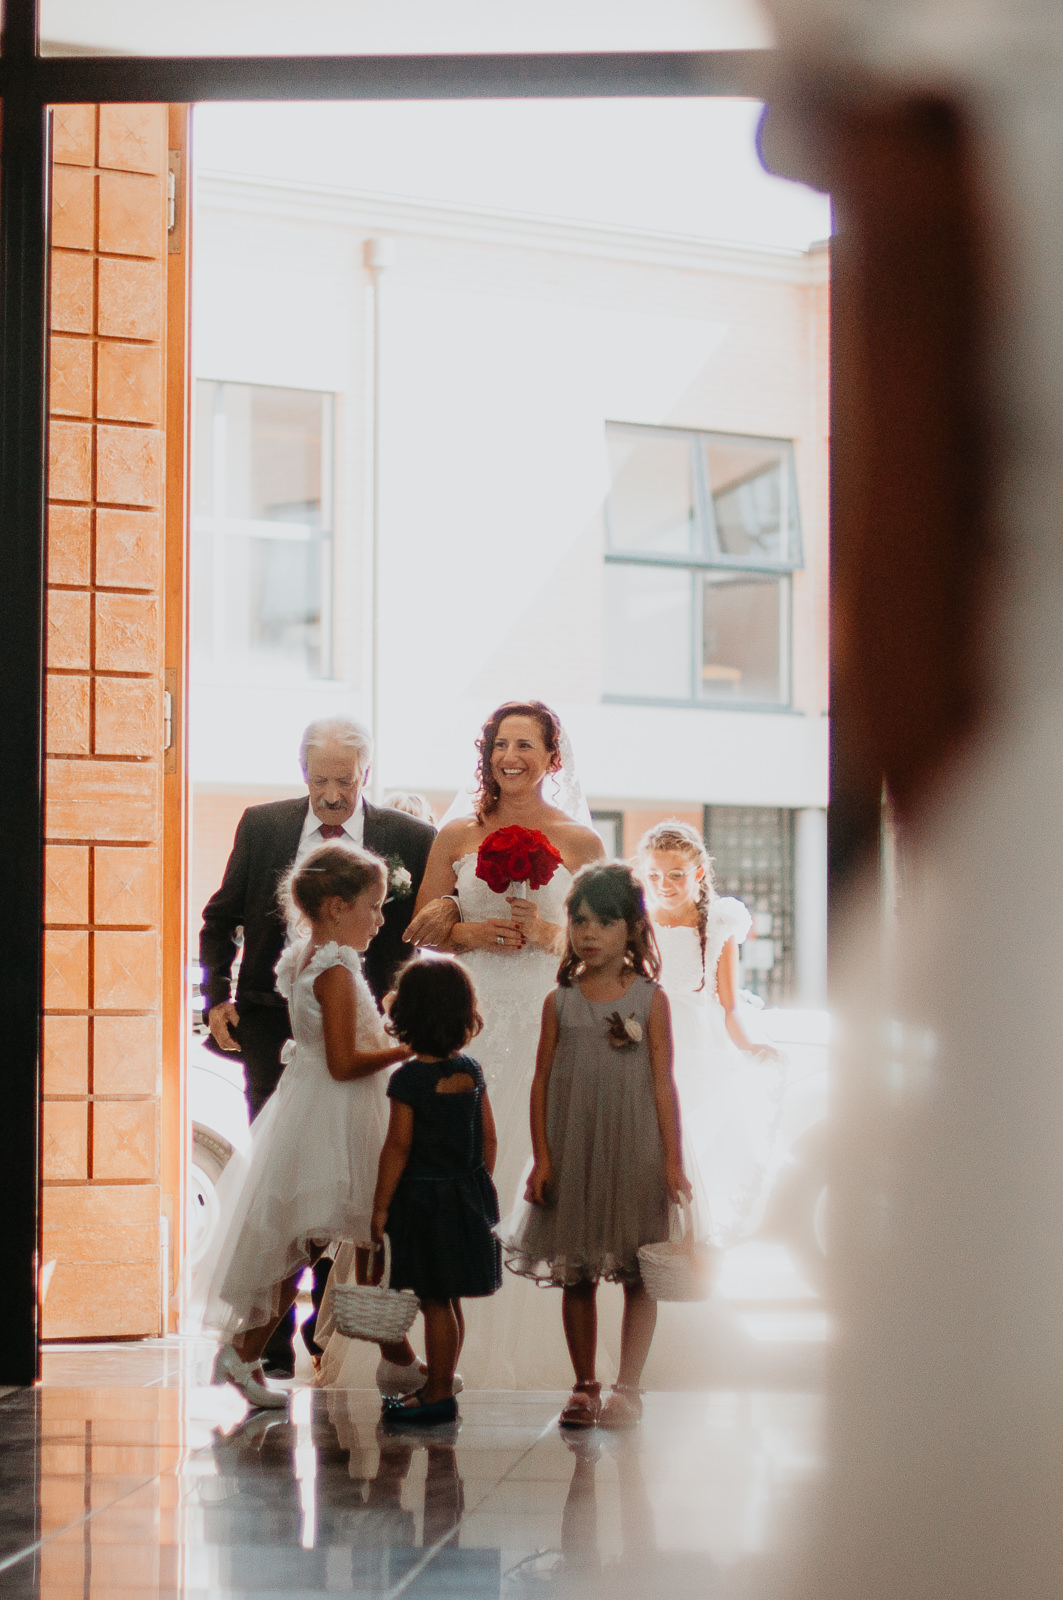 Best Wedding Photographers - Destination weddings -  Pat Cori Photography-12.jpg